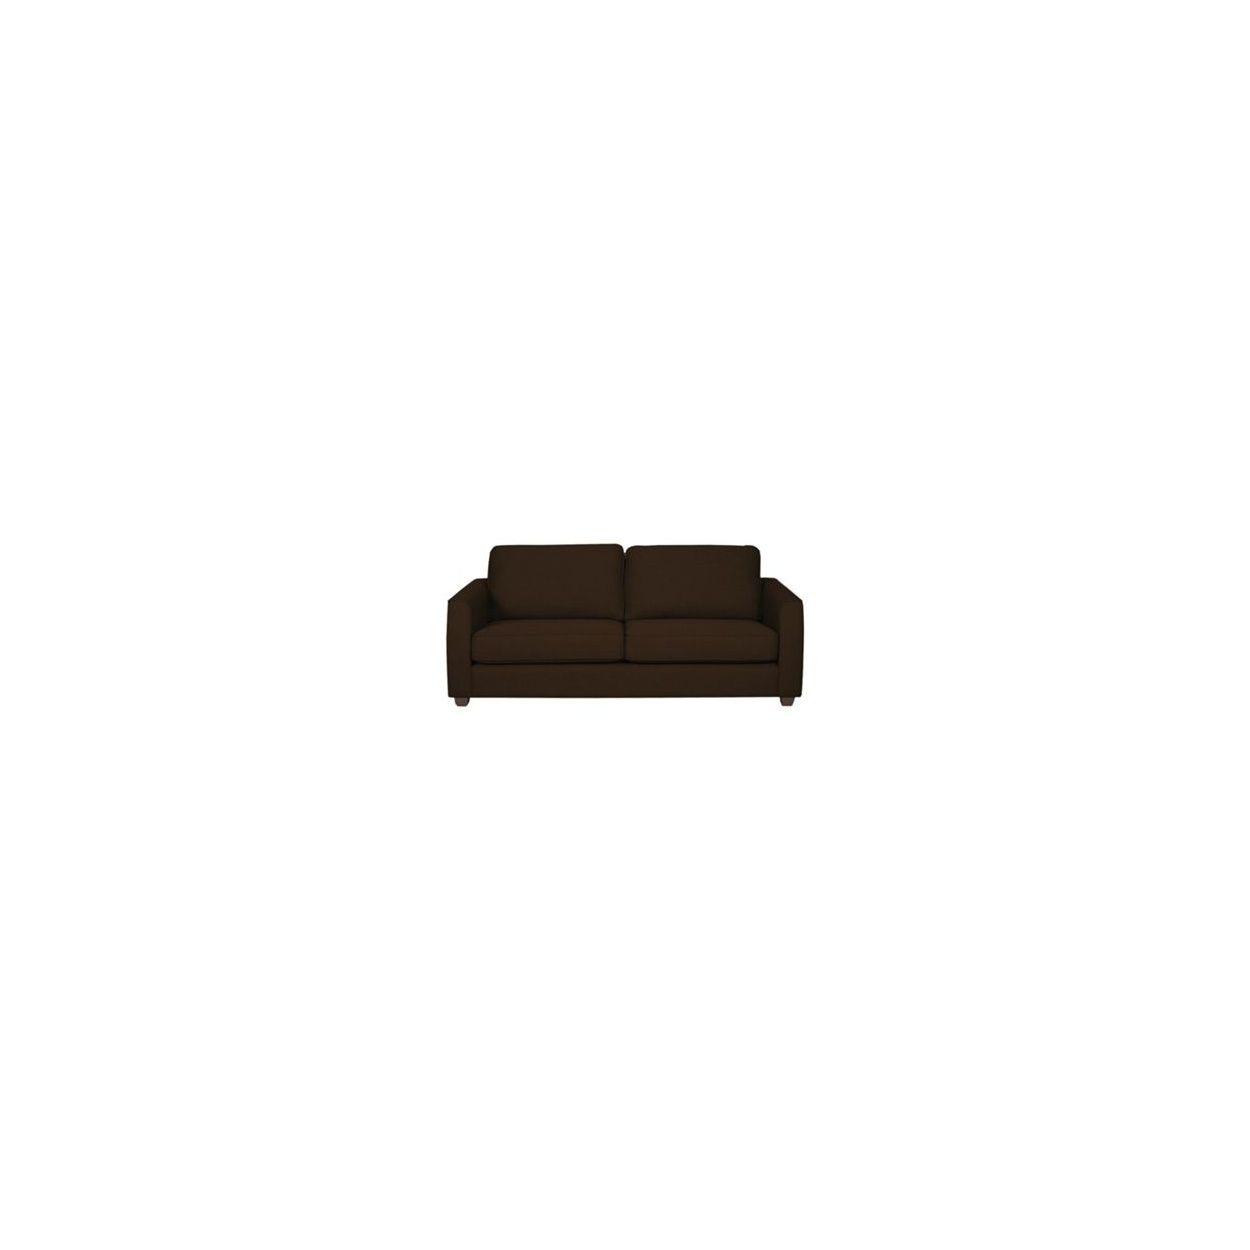 Excellent Debenhams Dante Sofa Bed At Debenhams Com 548 Sale Price Alphanode Cool Chair Designs And Ideas Alphanodeonline